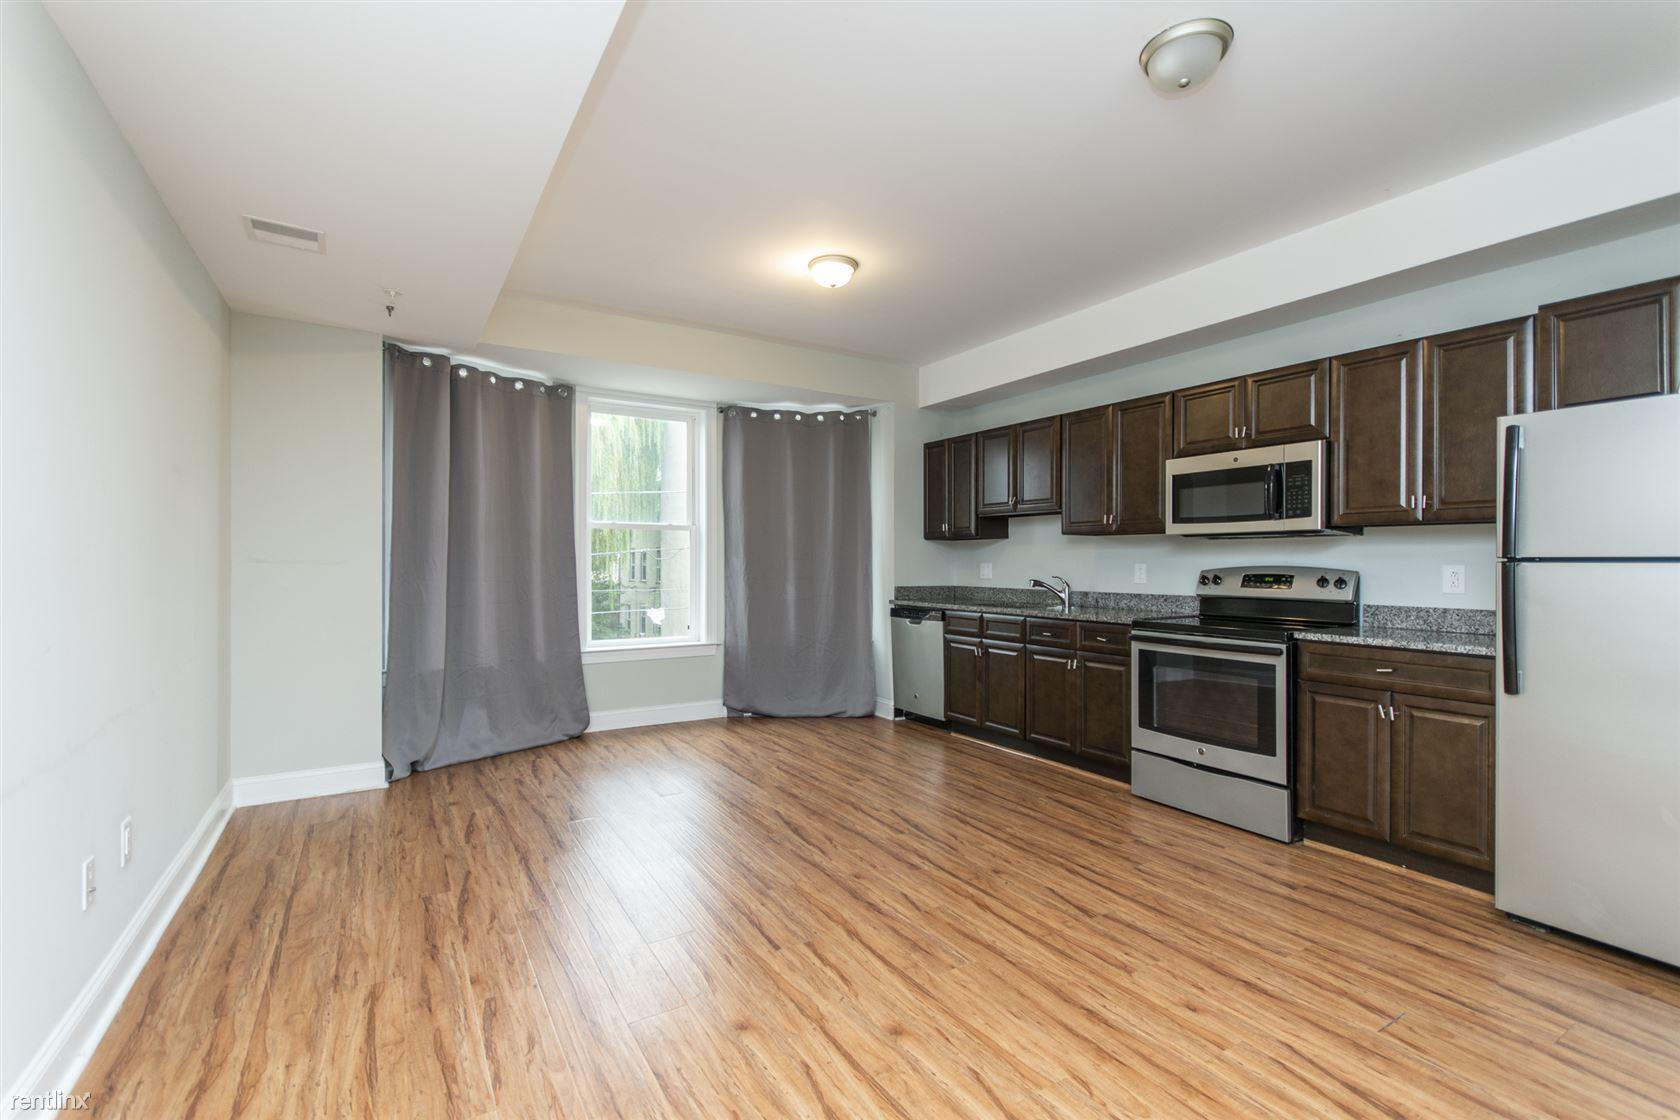 1222 N 7Th St BLDG E Unit 2, Philadelphia, PE - 1,500 CAD/ month